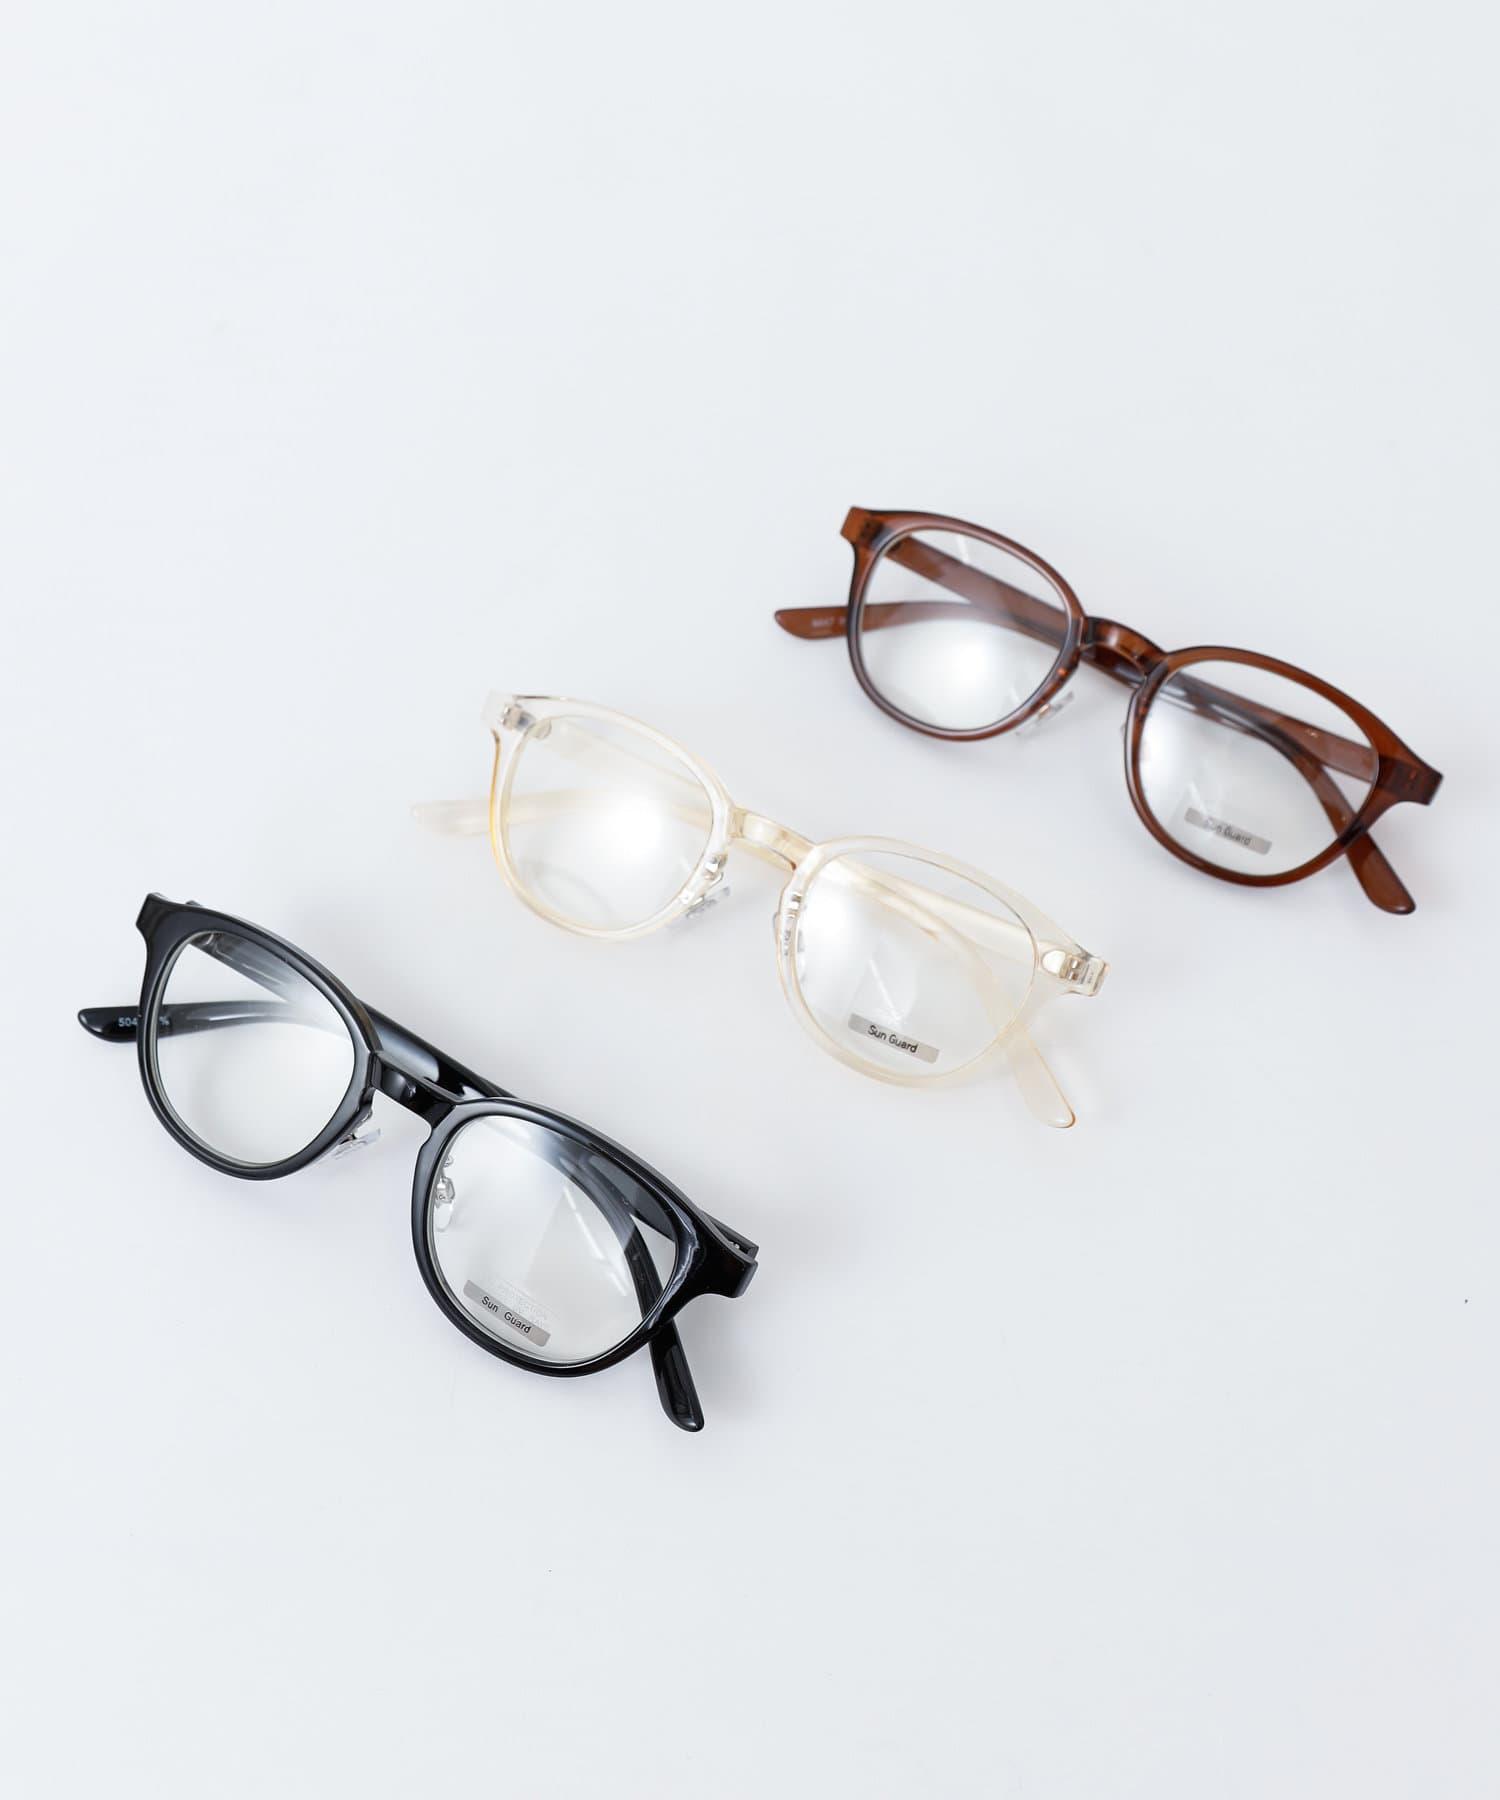 COLONY 2139(コロニー トゥーワンスリーナイン) 《UVカット99%》太フレームサングラス/伊達眼鏡